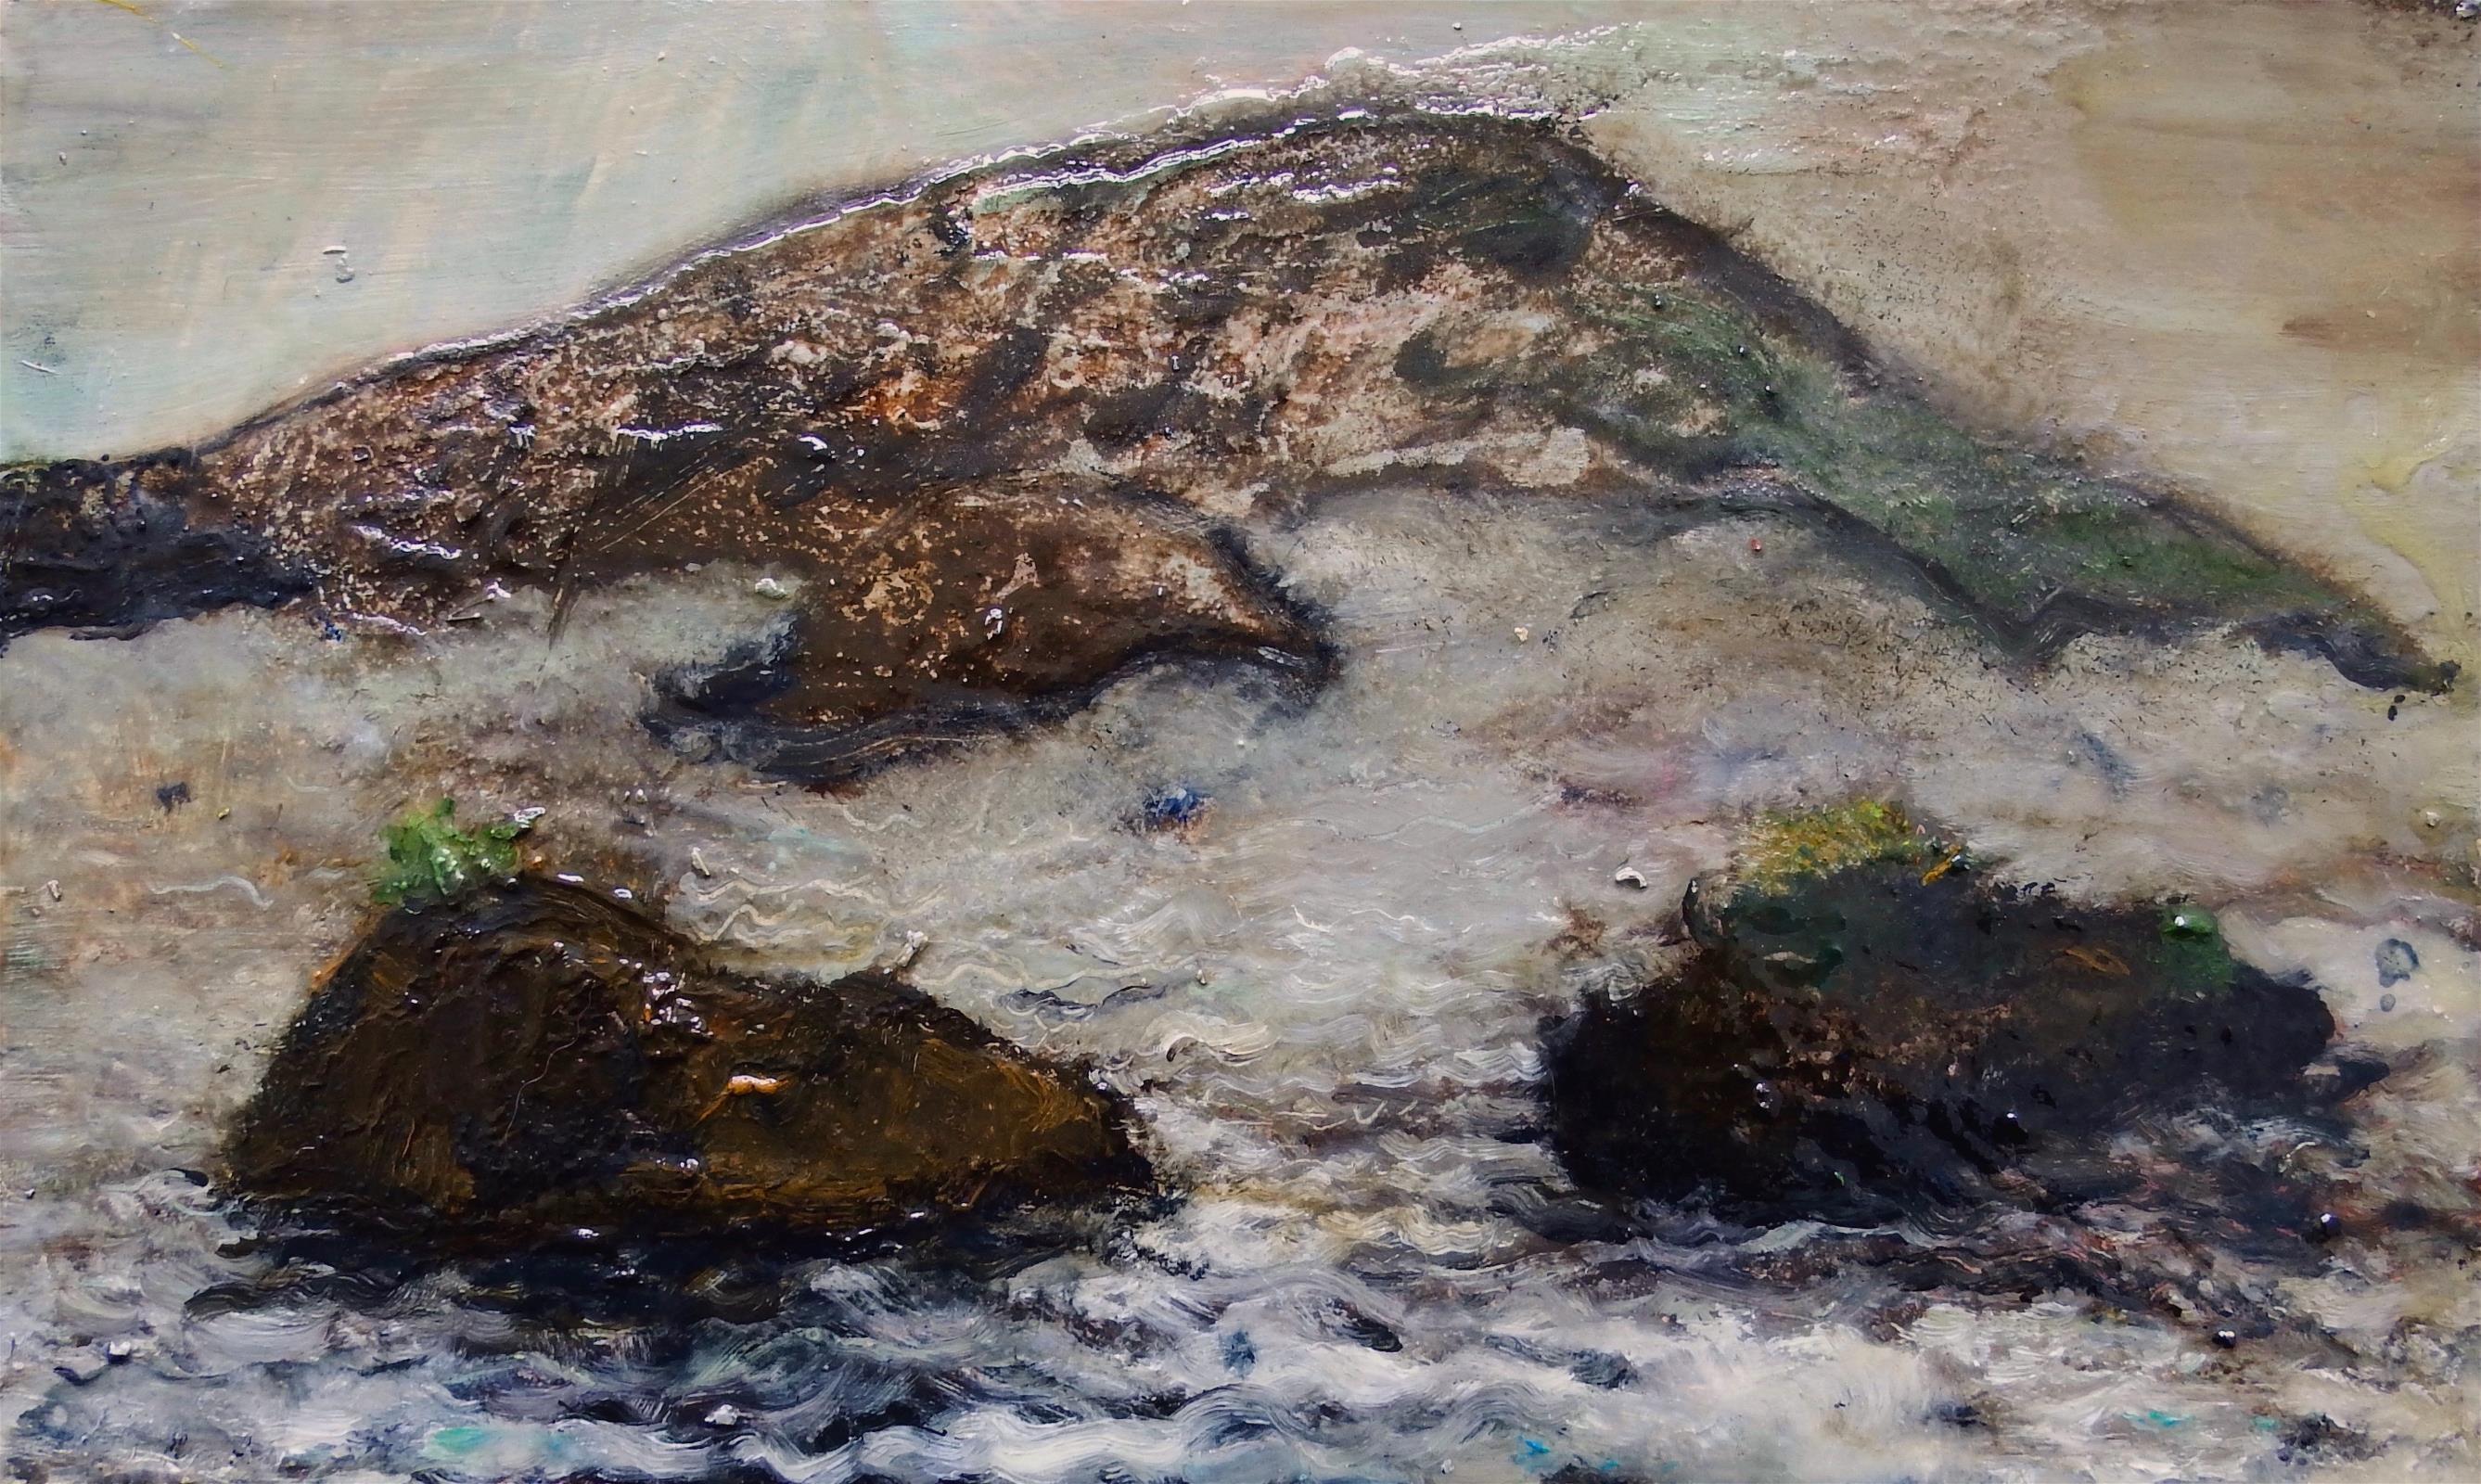 Lainch (A Heavy Sea)